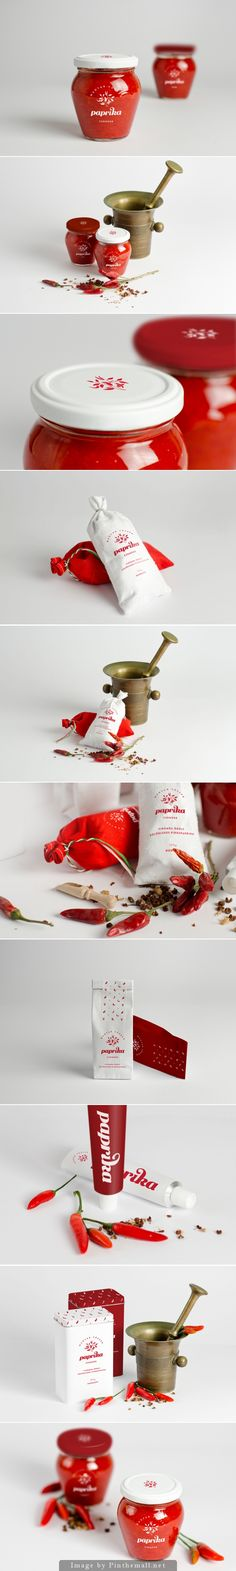 Paprika packaging design